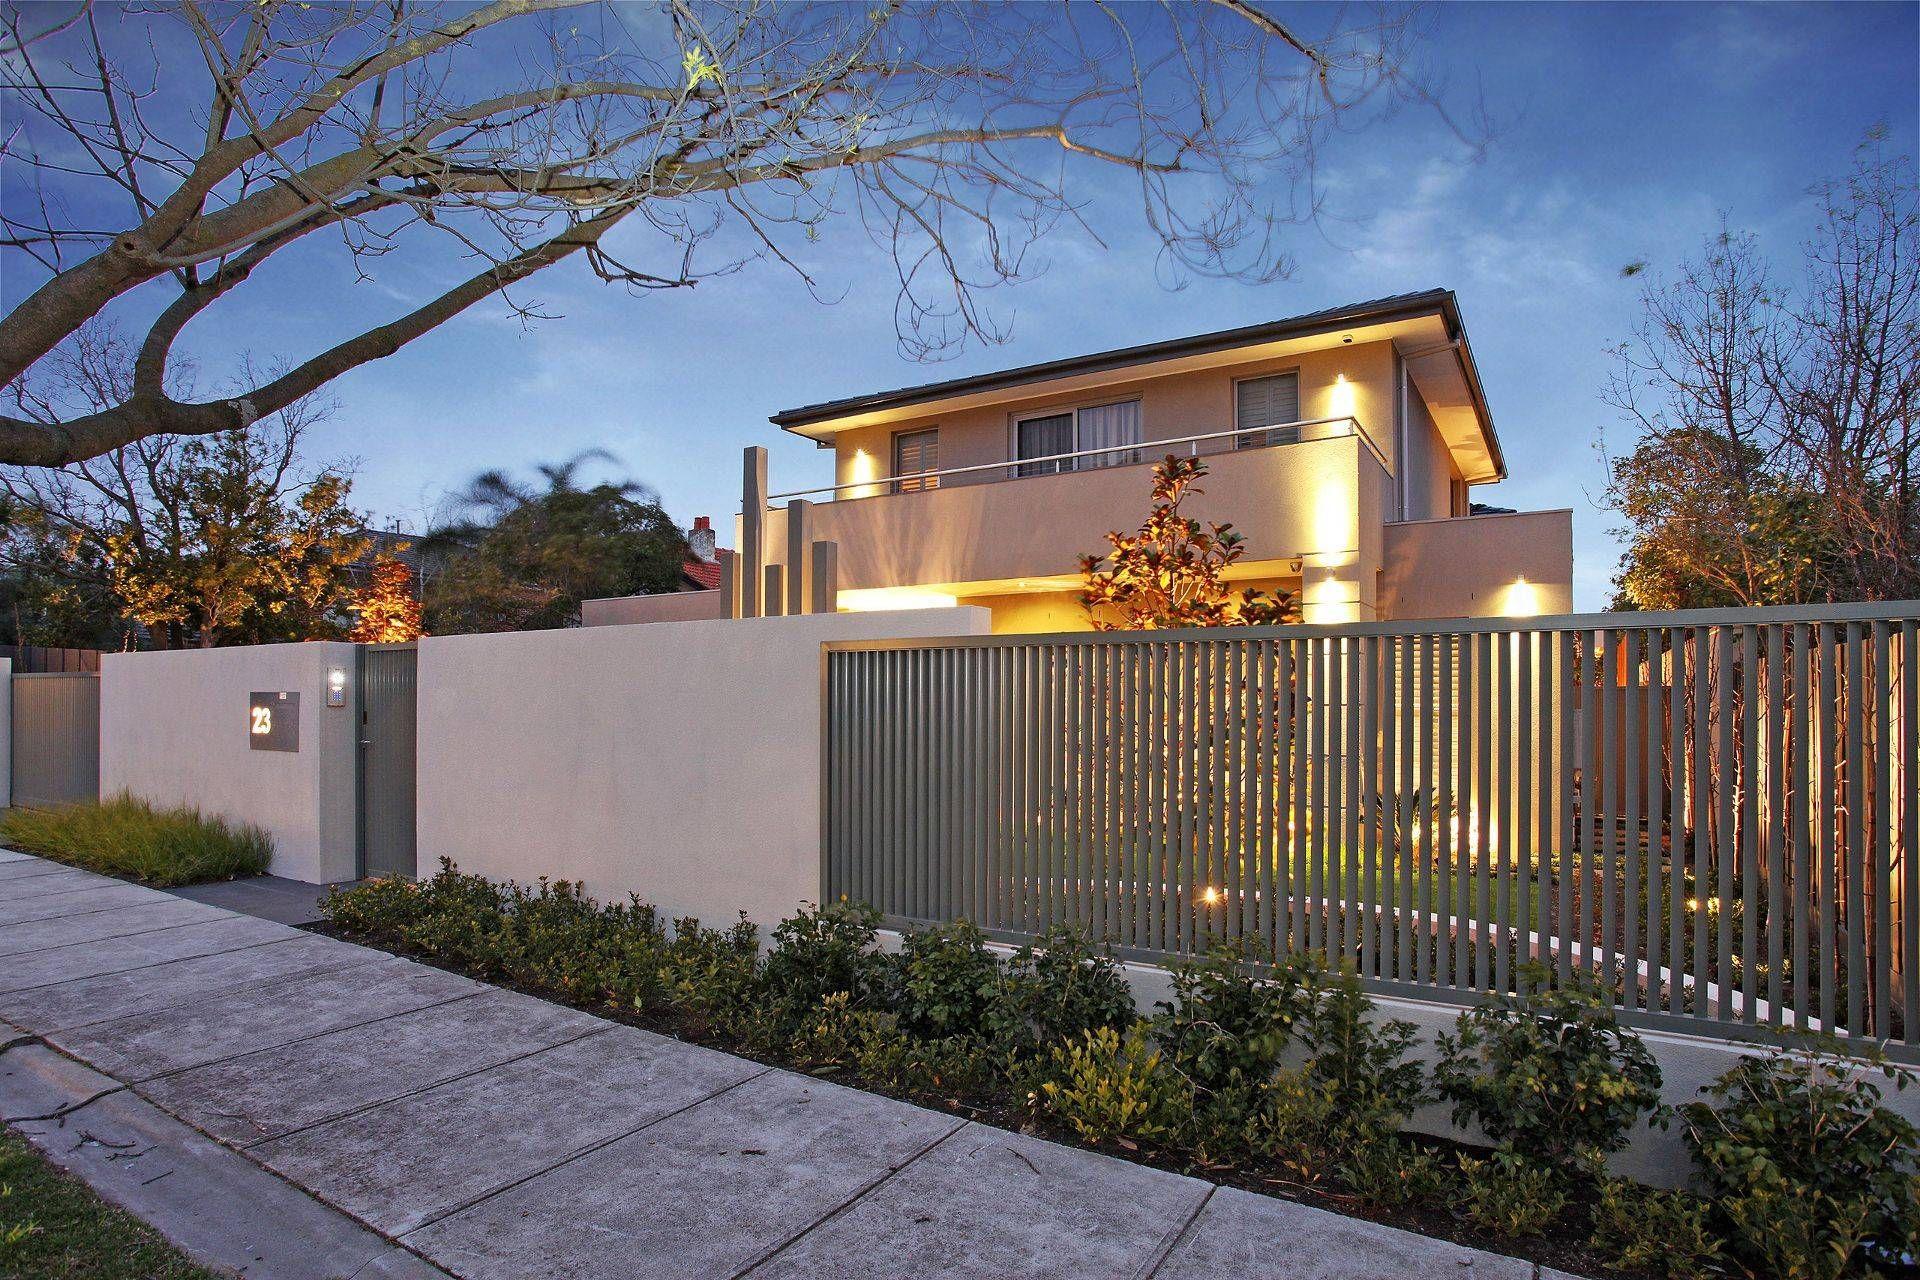 11 Marvelous Wood Fence 77379 Ideas Fence Design 640 x 480